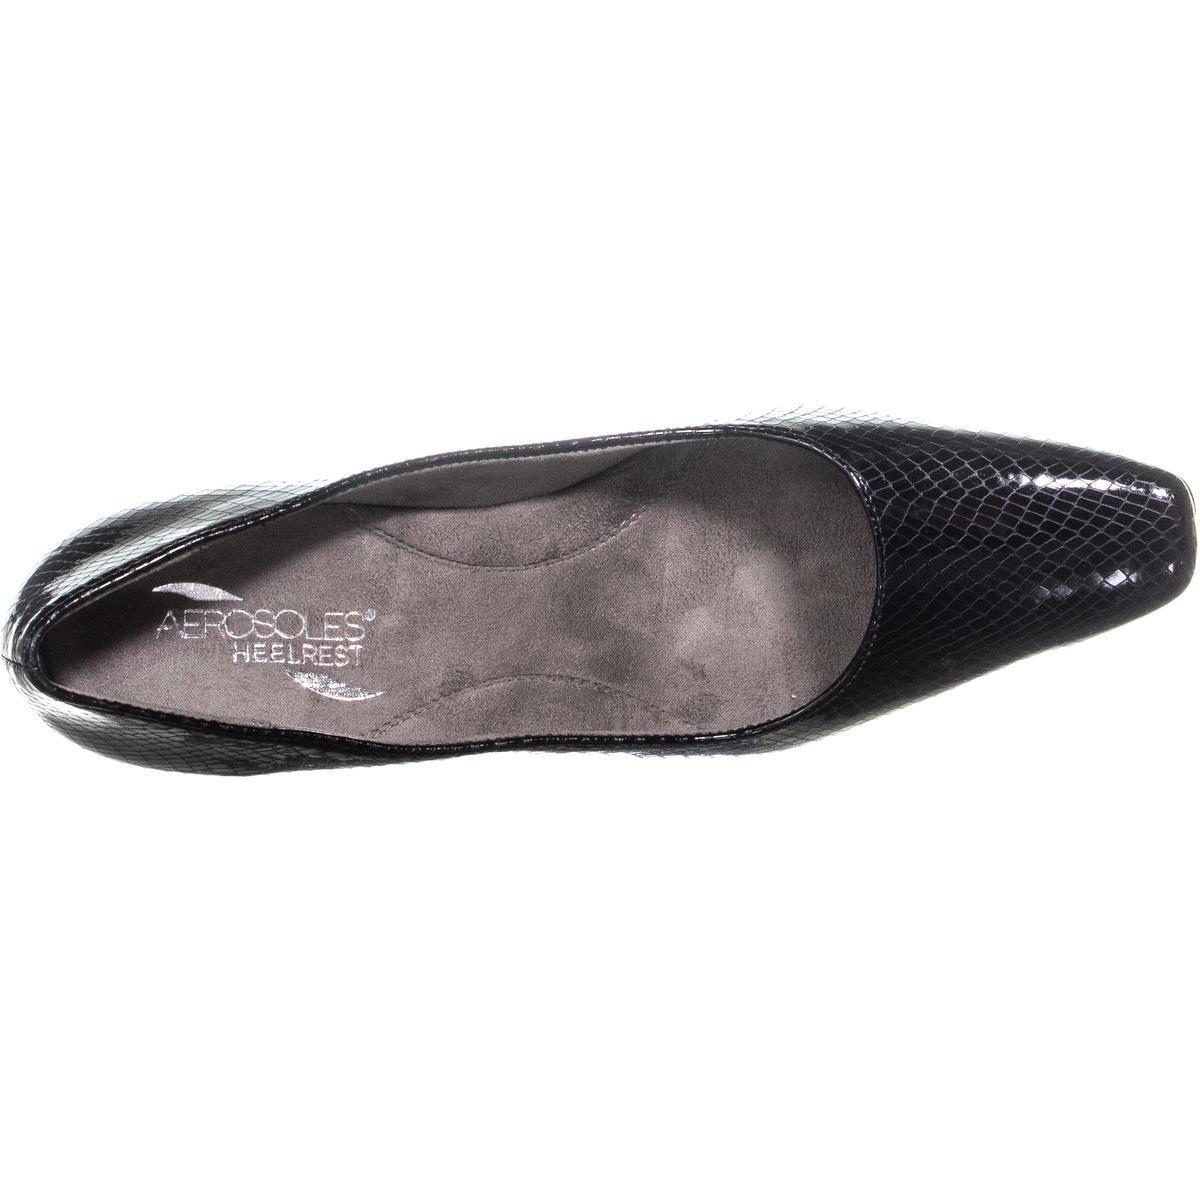 f96249b716 Aerosoles Cheerful Kitten Heels, Black in Black - Lyst